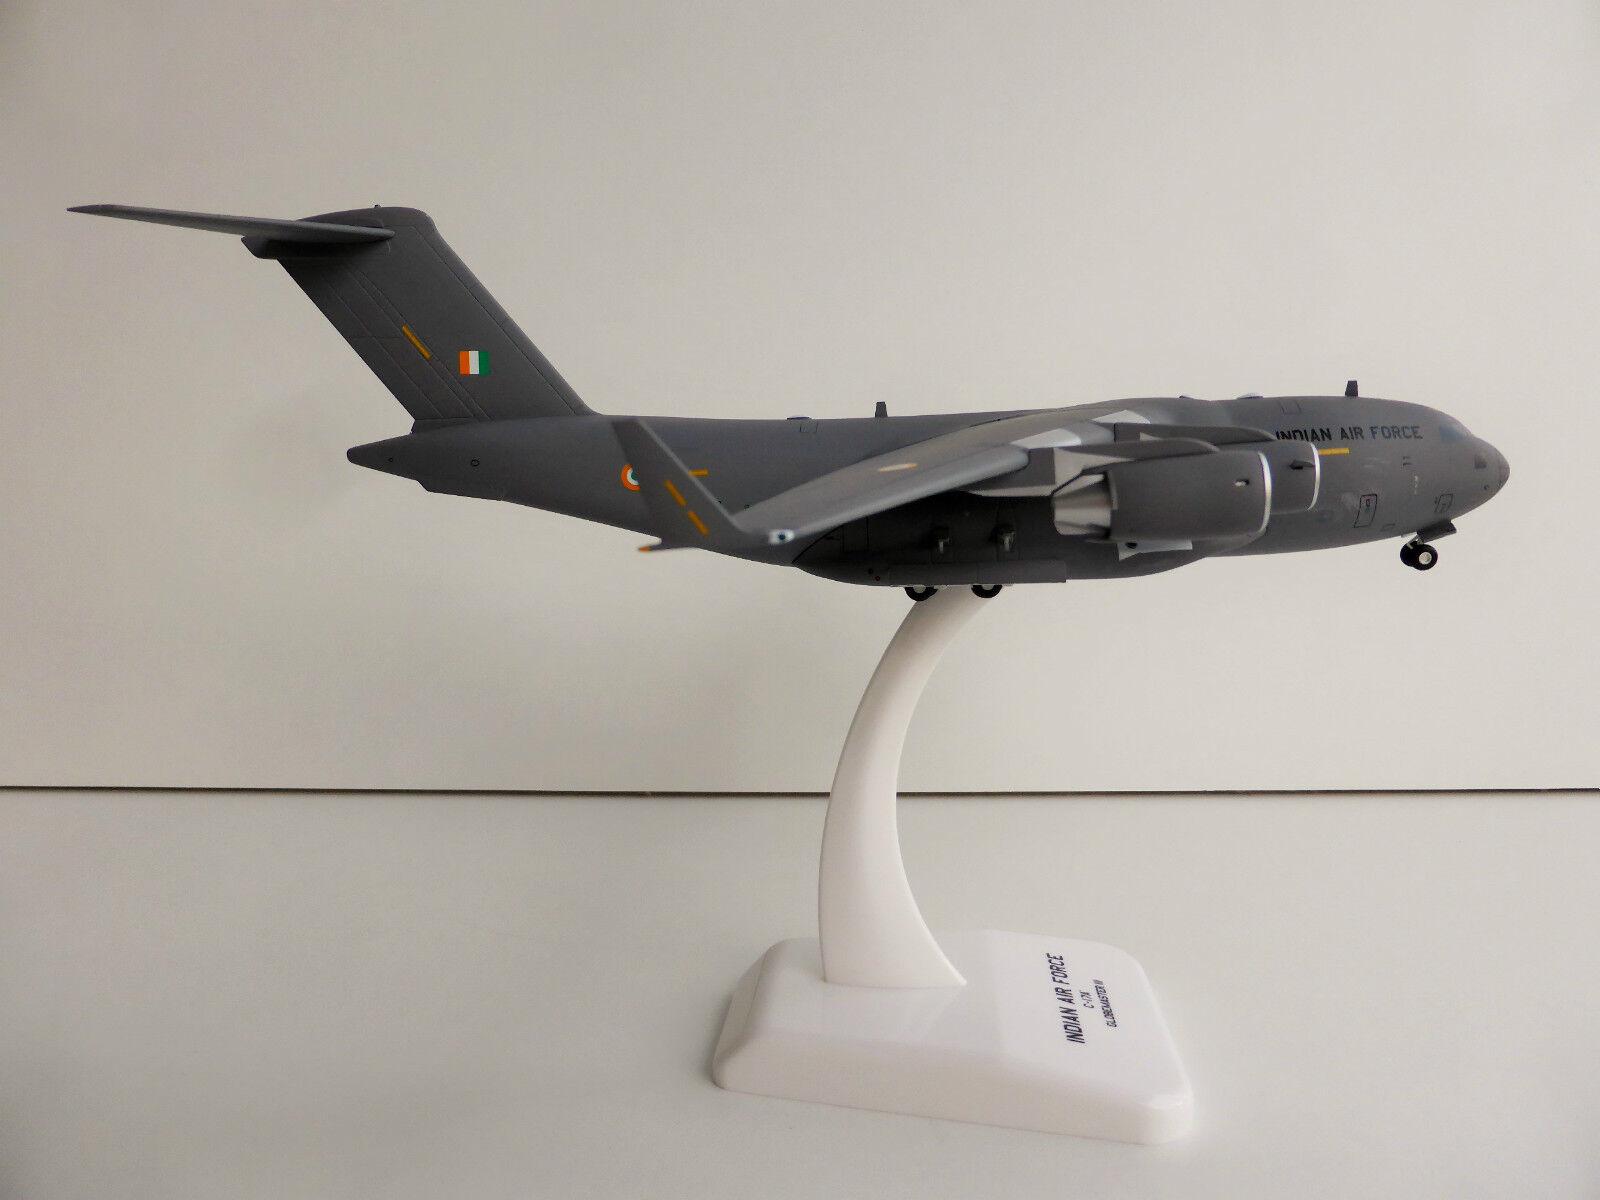 Boeing c-17a Globemaster III Indian Force 1 200 Hogan 5774 M-series c-17